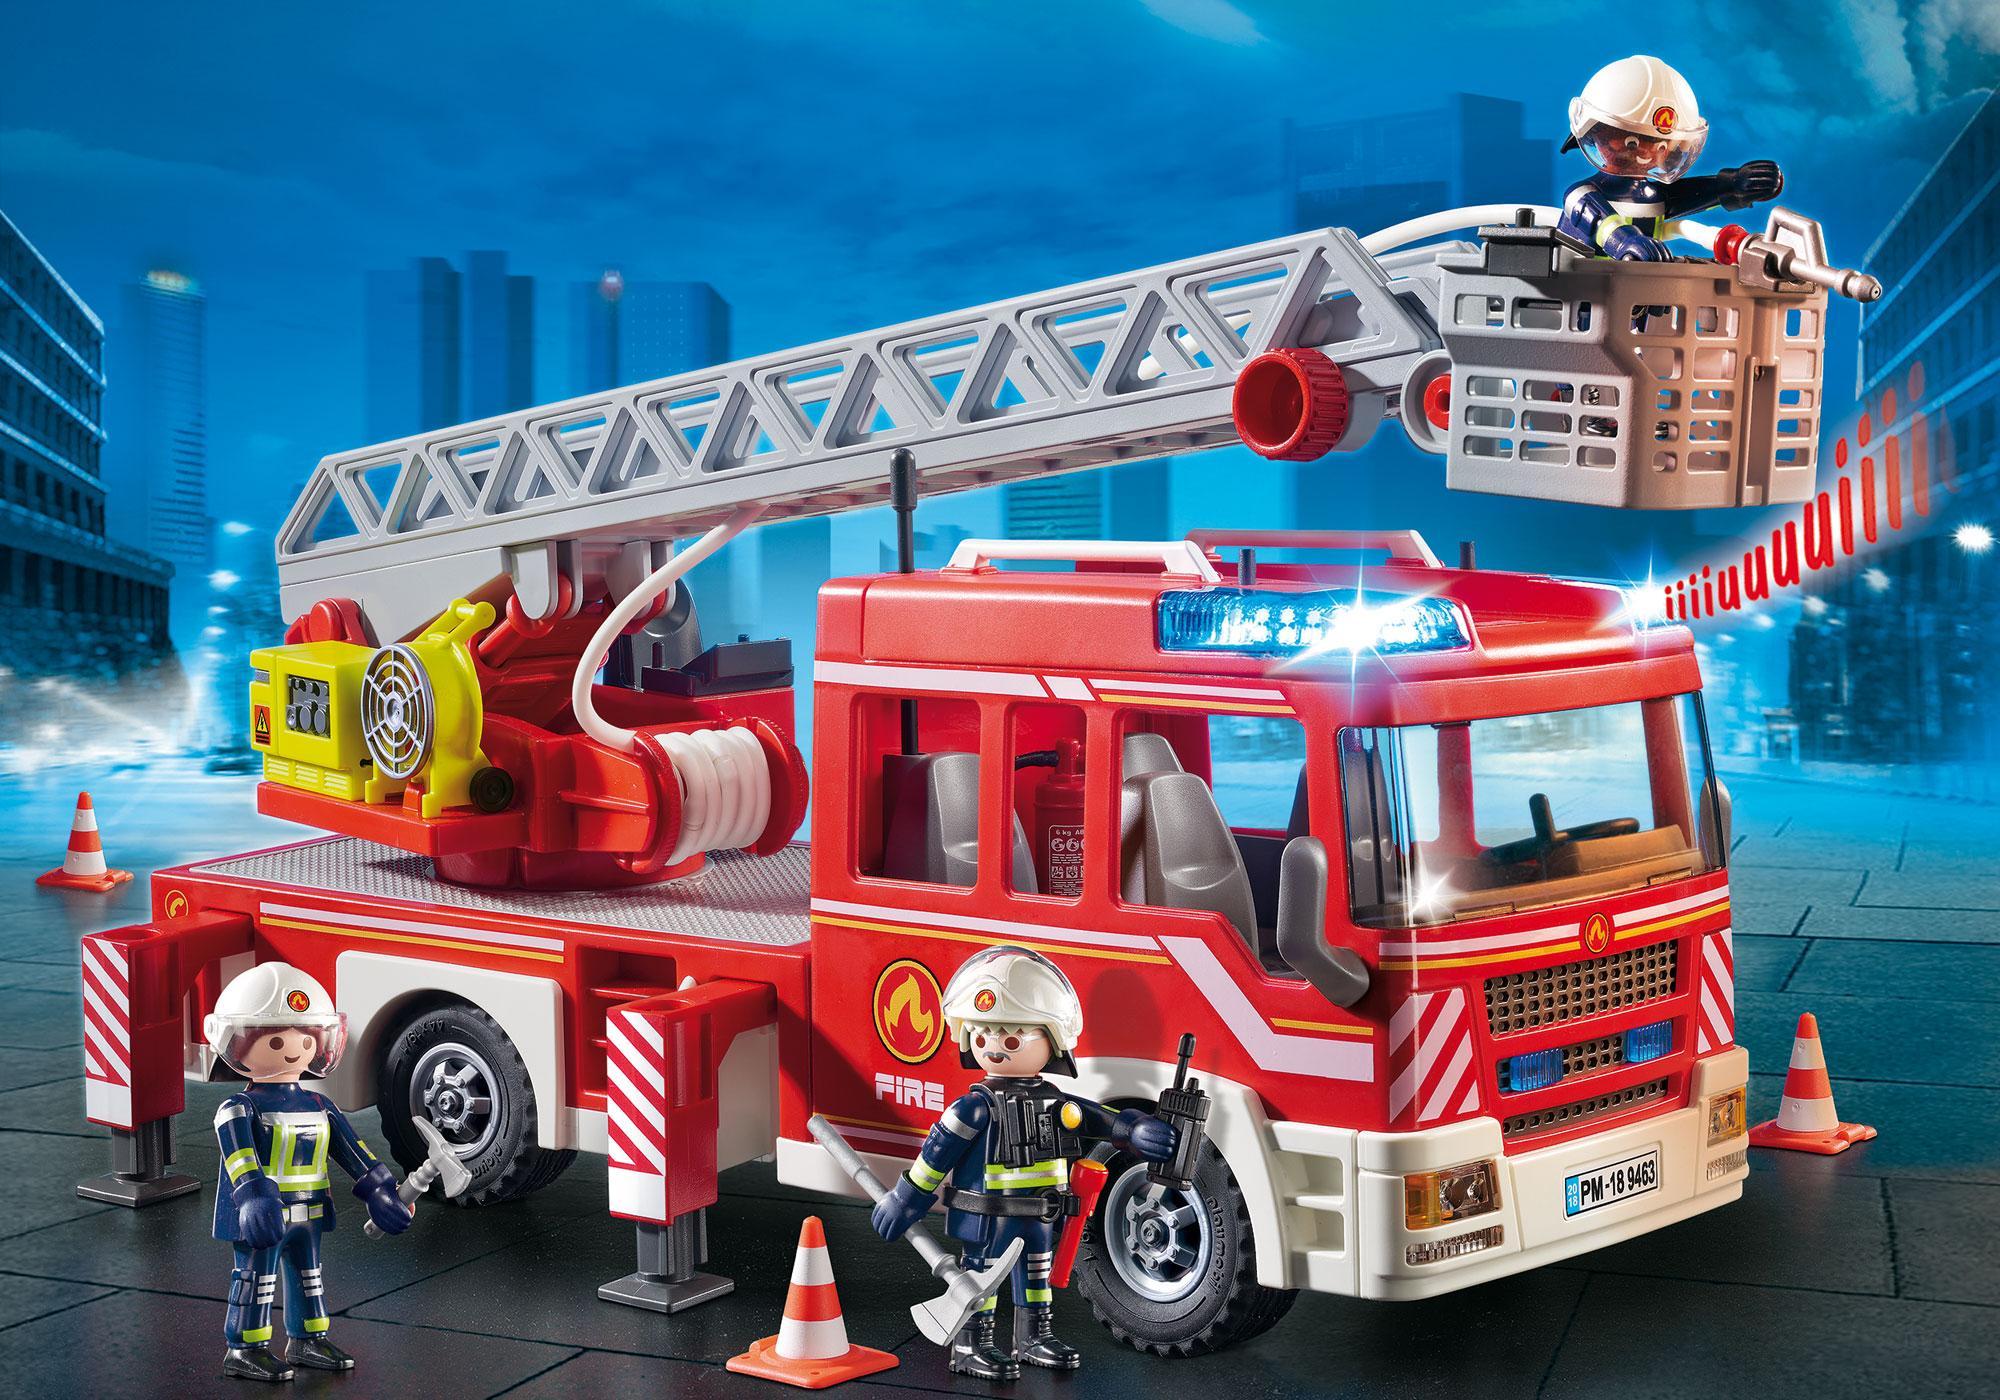 http://media.playmobil.com/i/playmobil/9463_product_detail/Brandweer ladderwagen